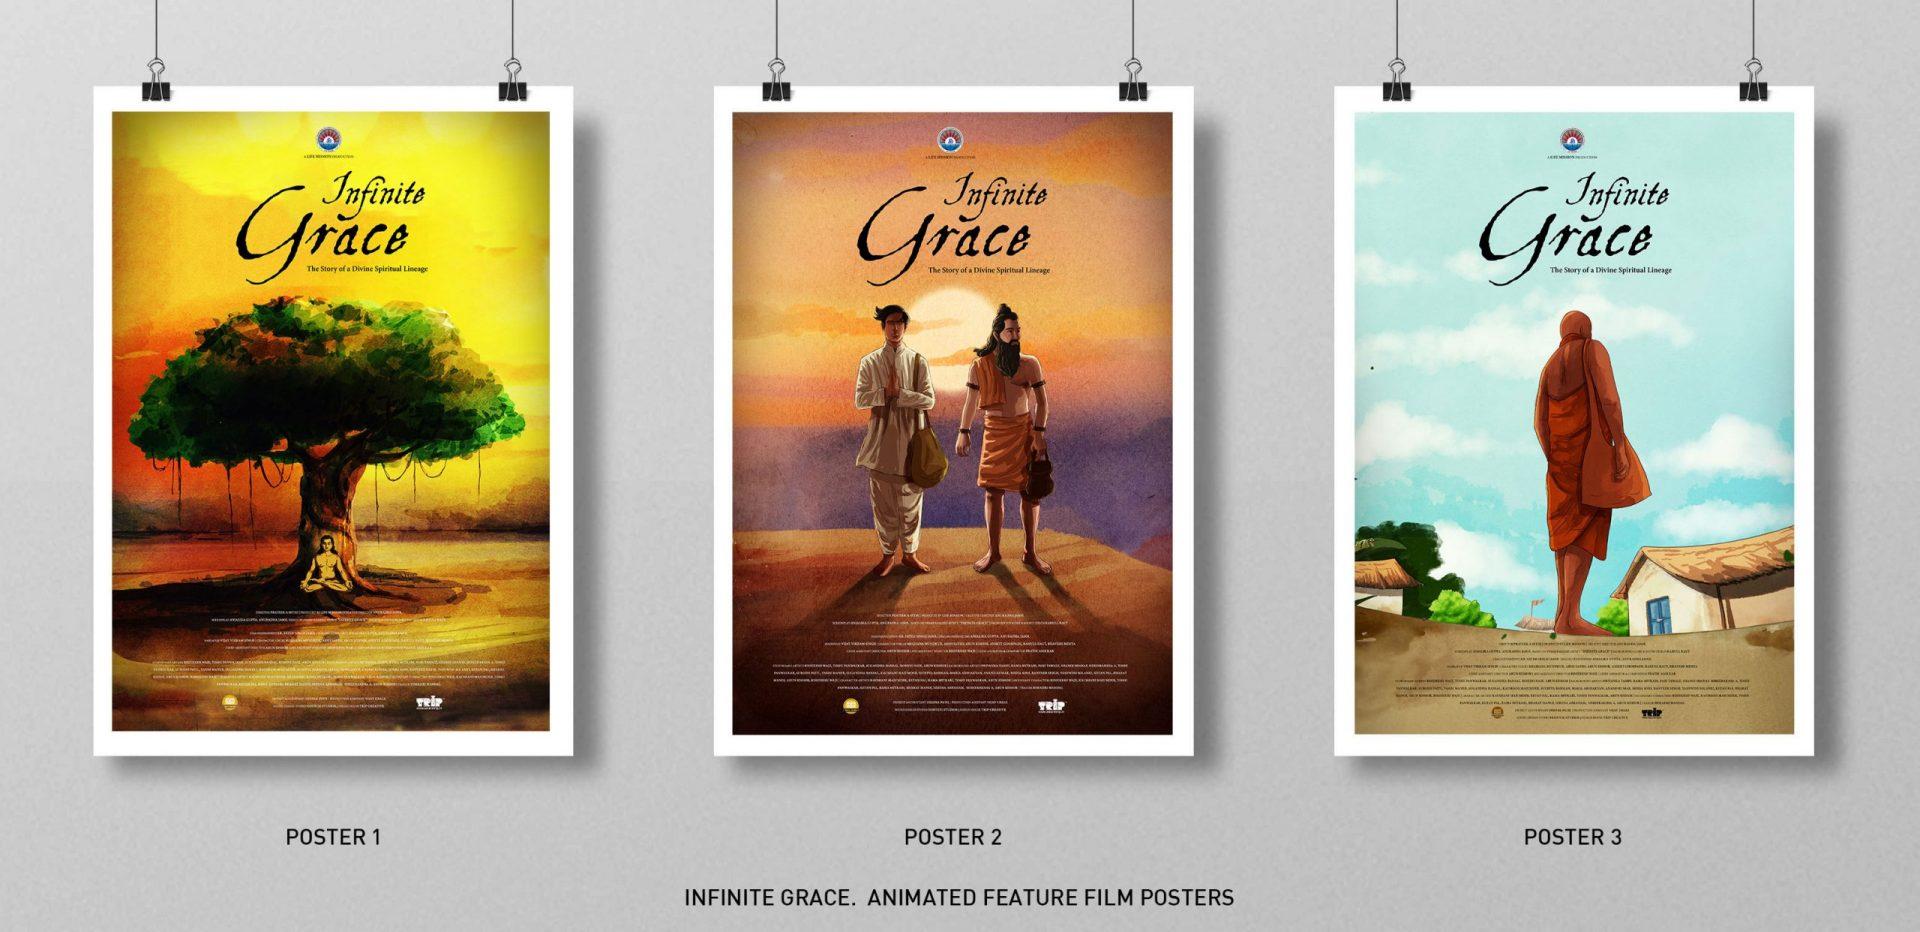 Infinite-Grace-Movie-Posters